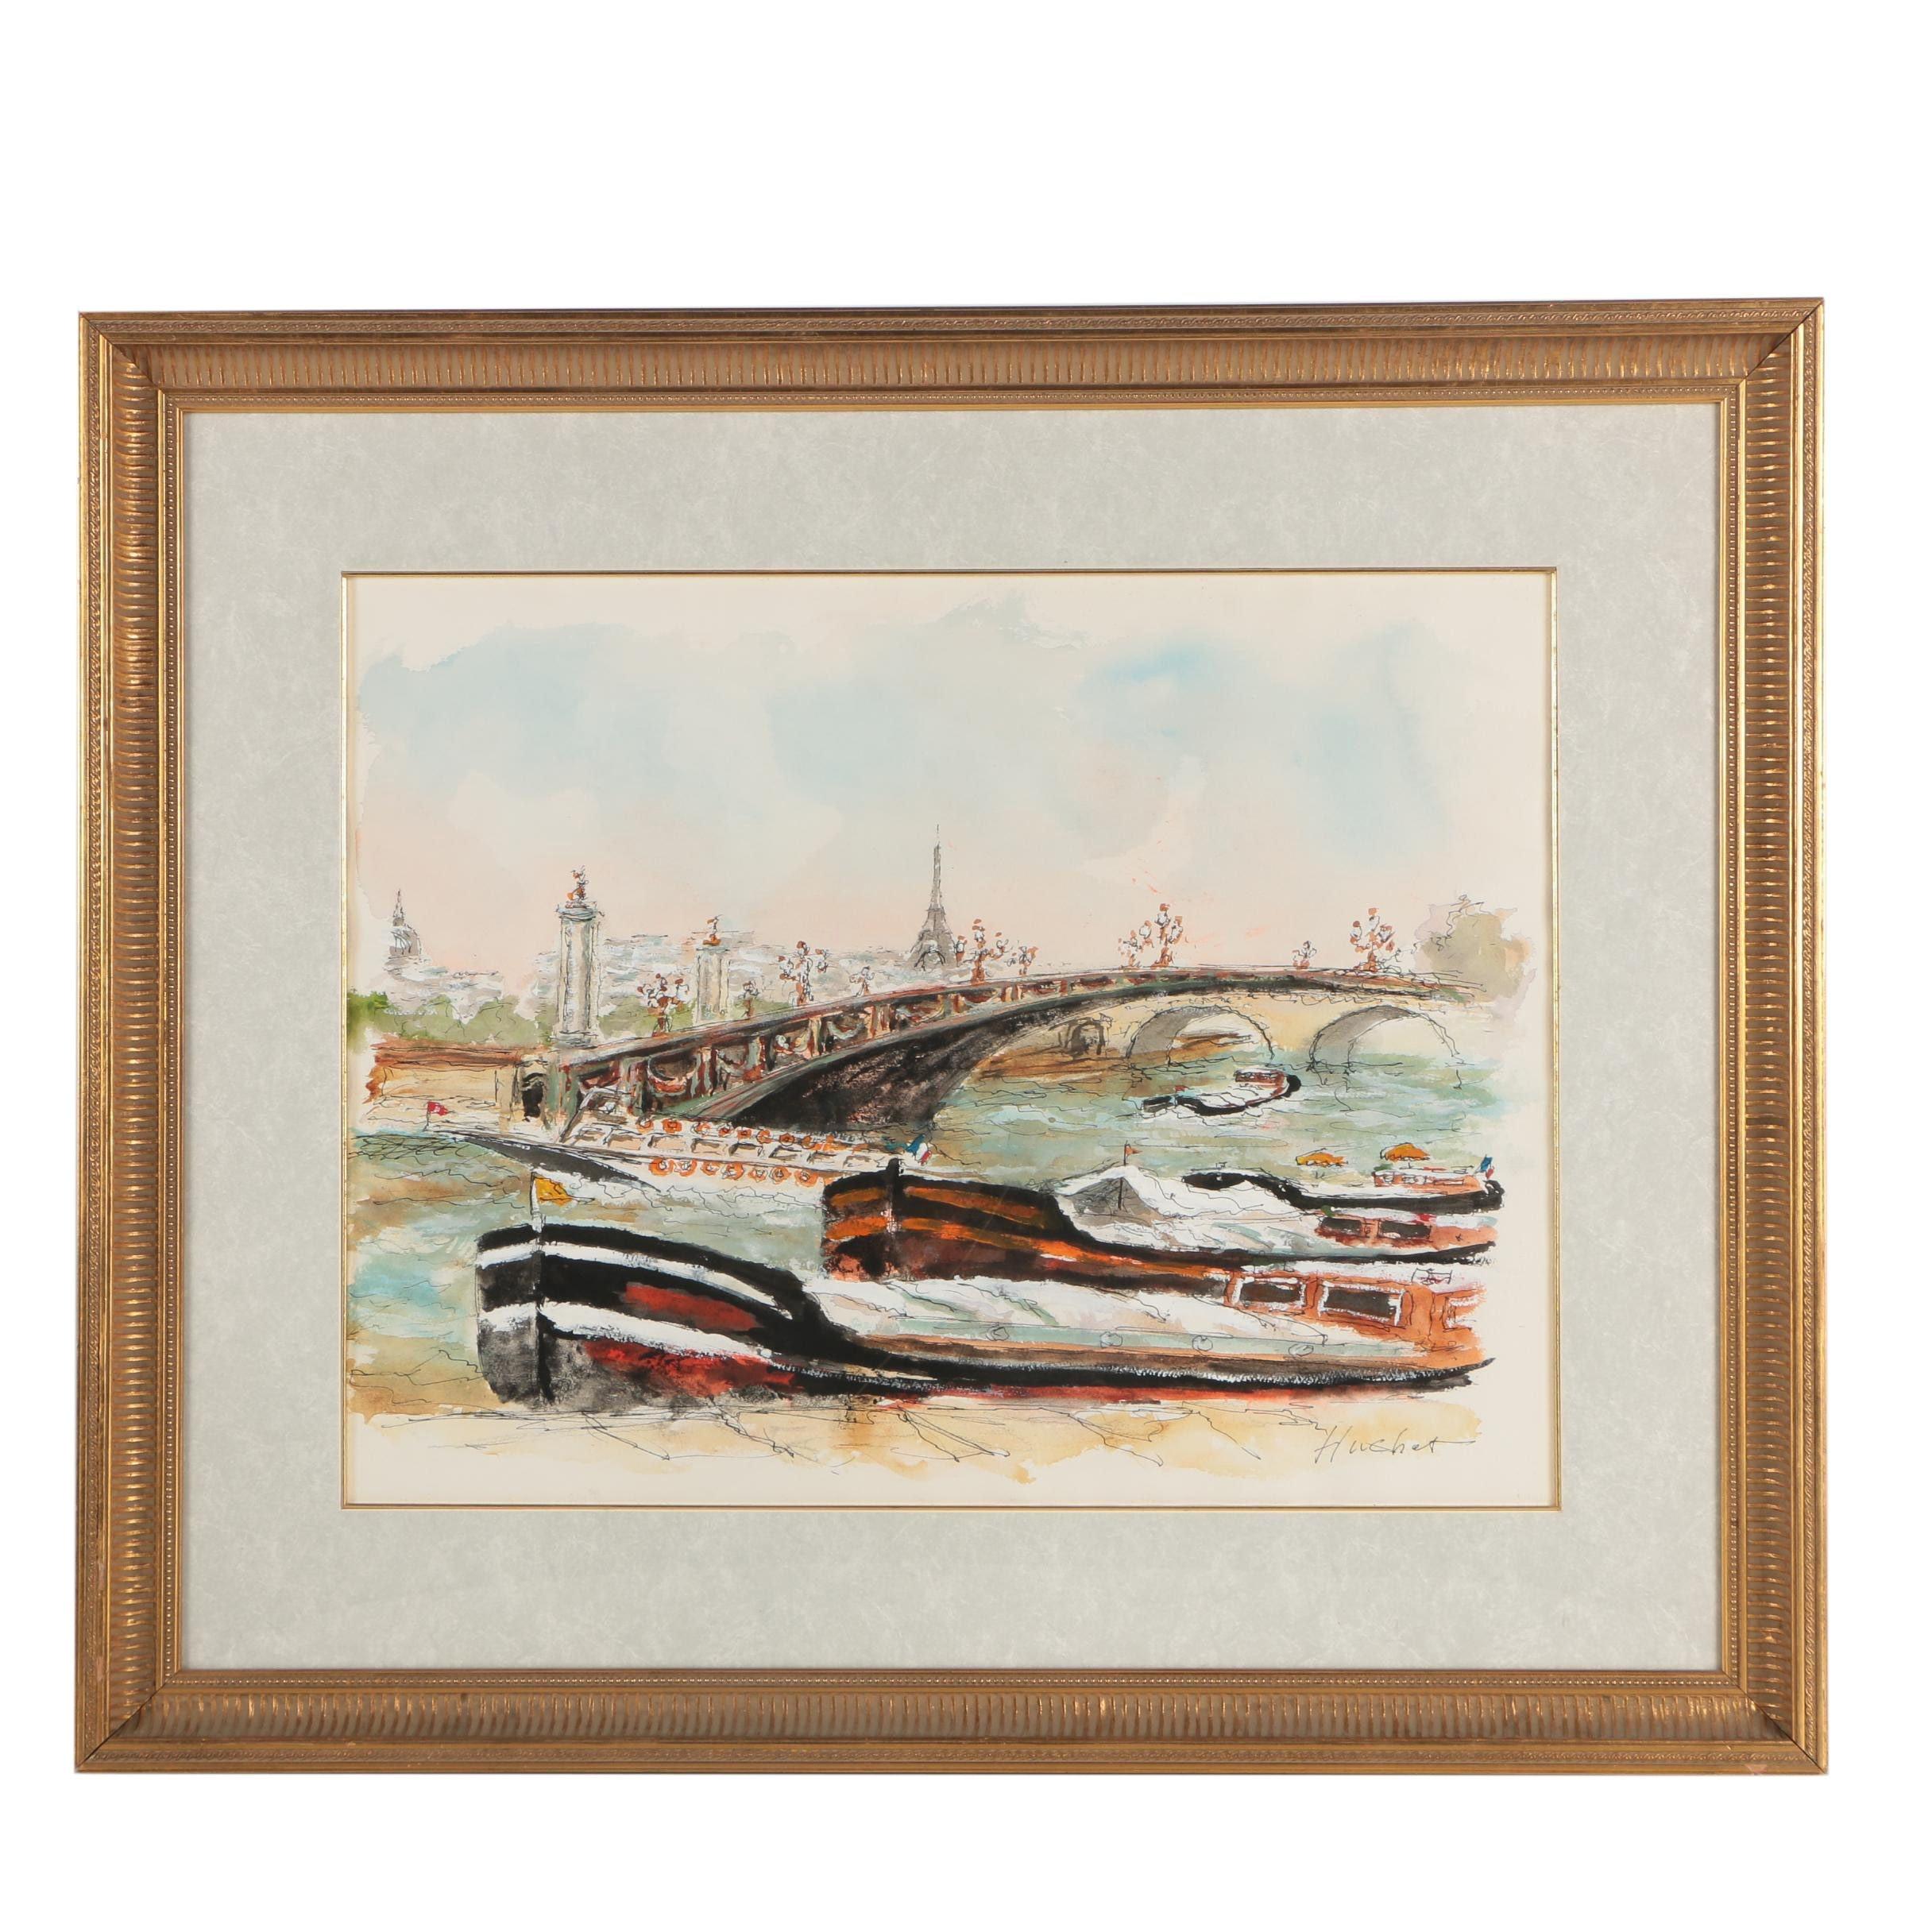 Urbain Emmanuel Huchet Signed Watercolor Painting of the Seine River, Paris